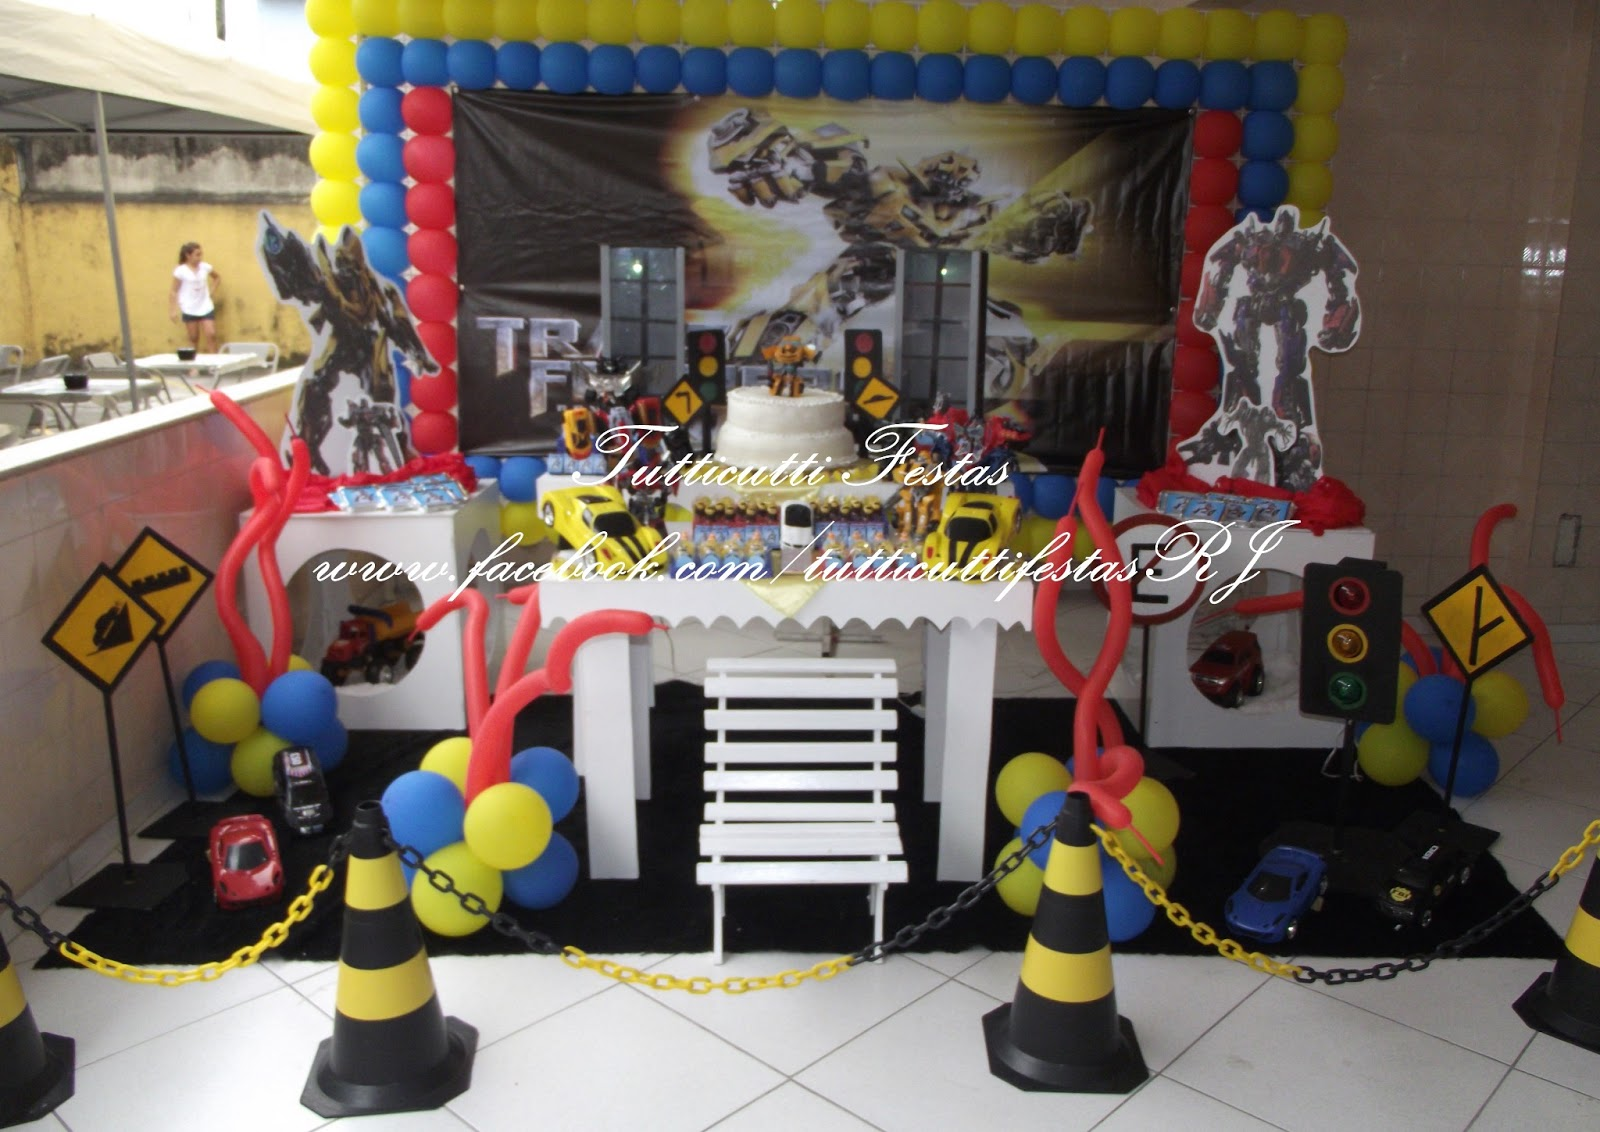 Transformers Provençal  Tutticutti festas